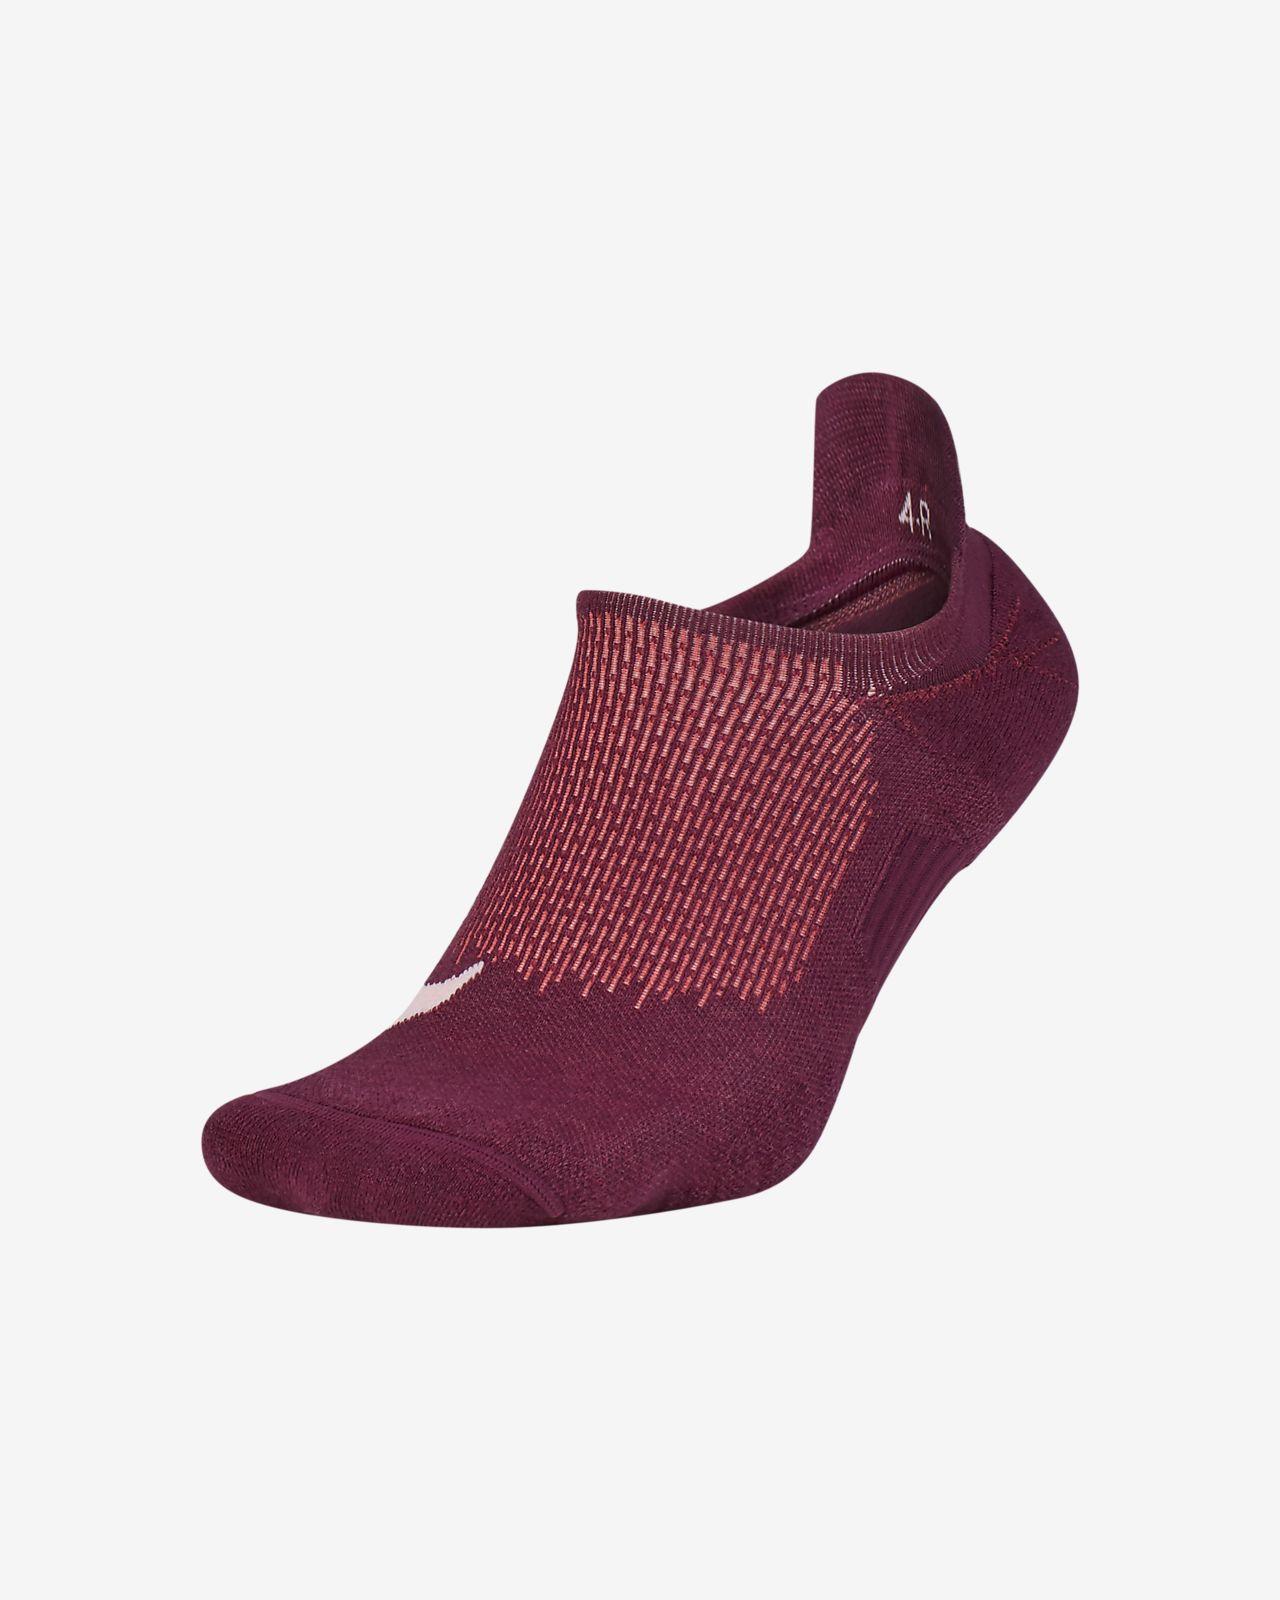 Nike Spark Wool No-Show Running Socks